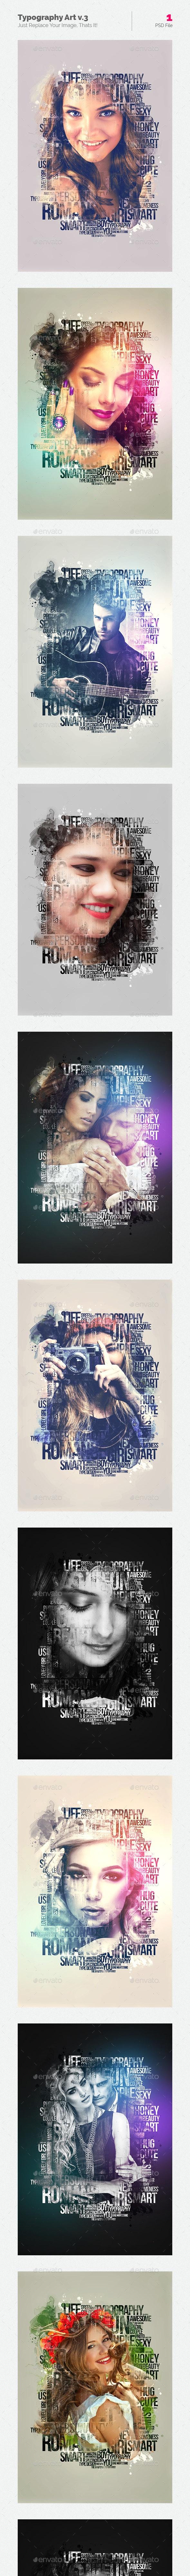 Typography Art v.3 - Artistic Photo Templates